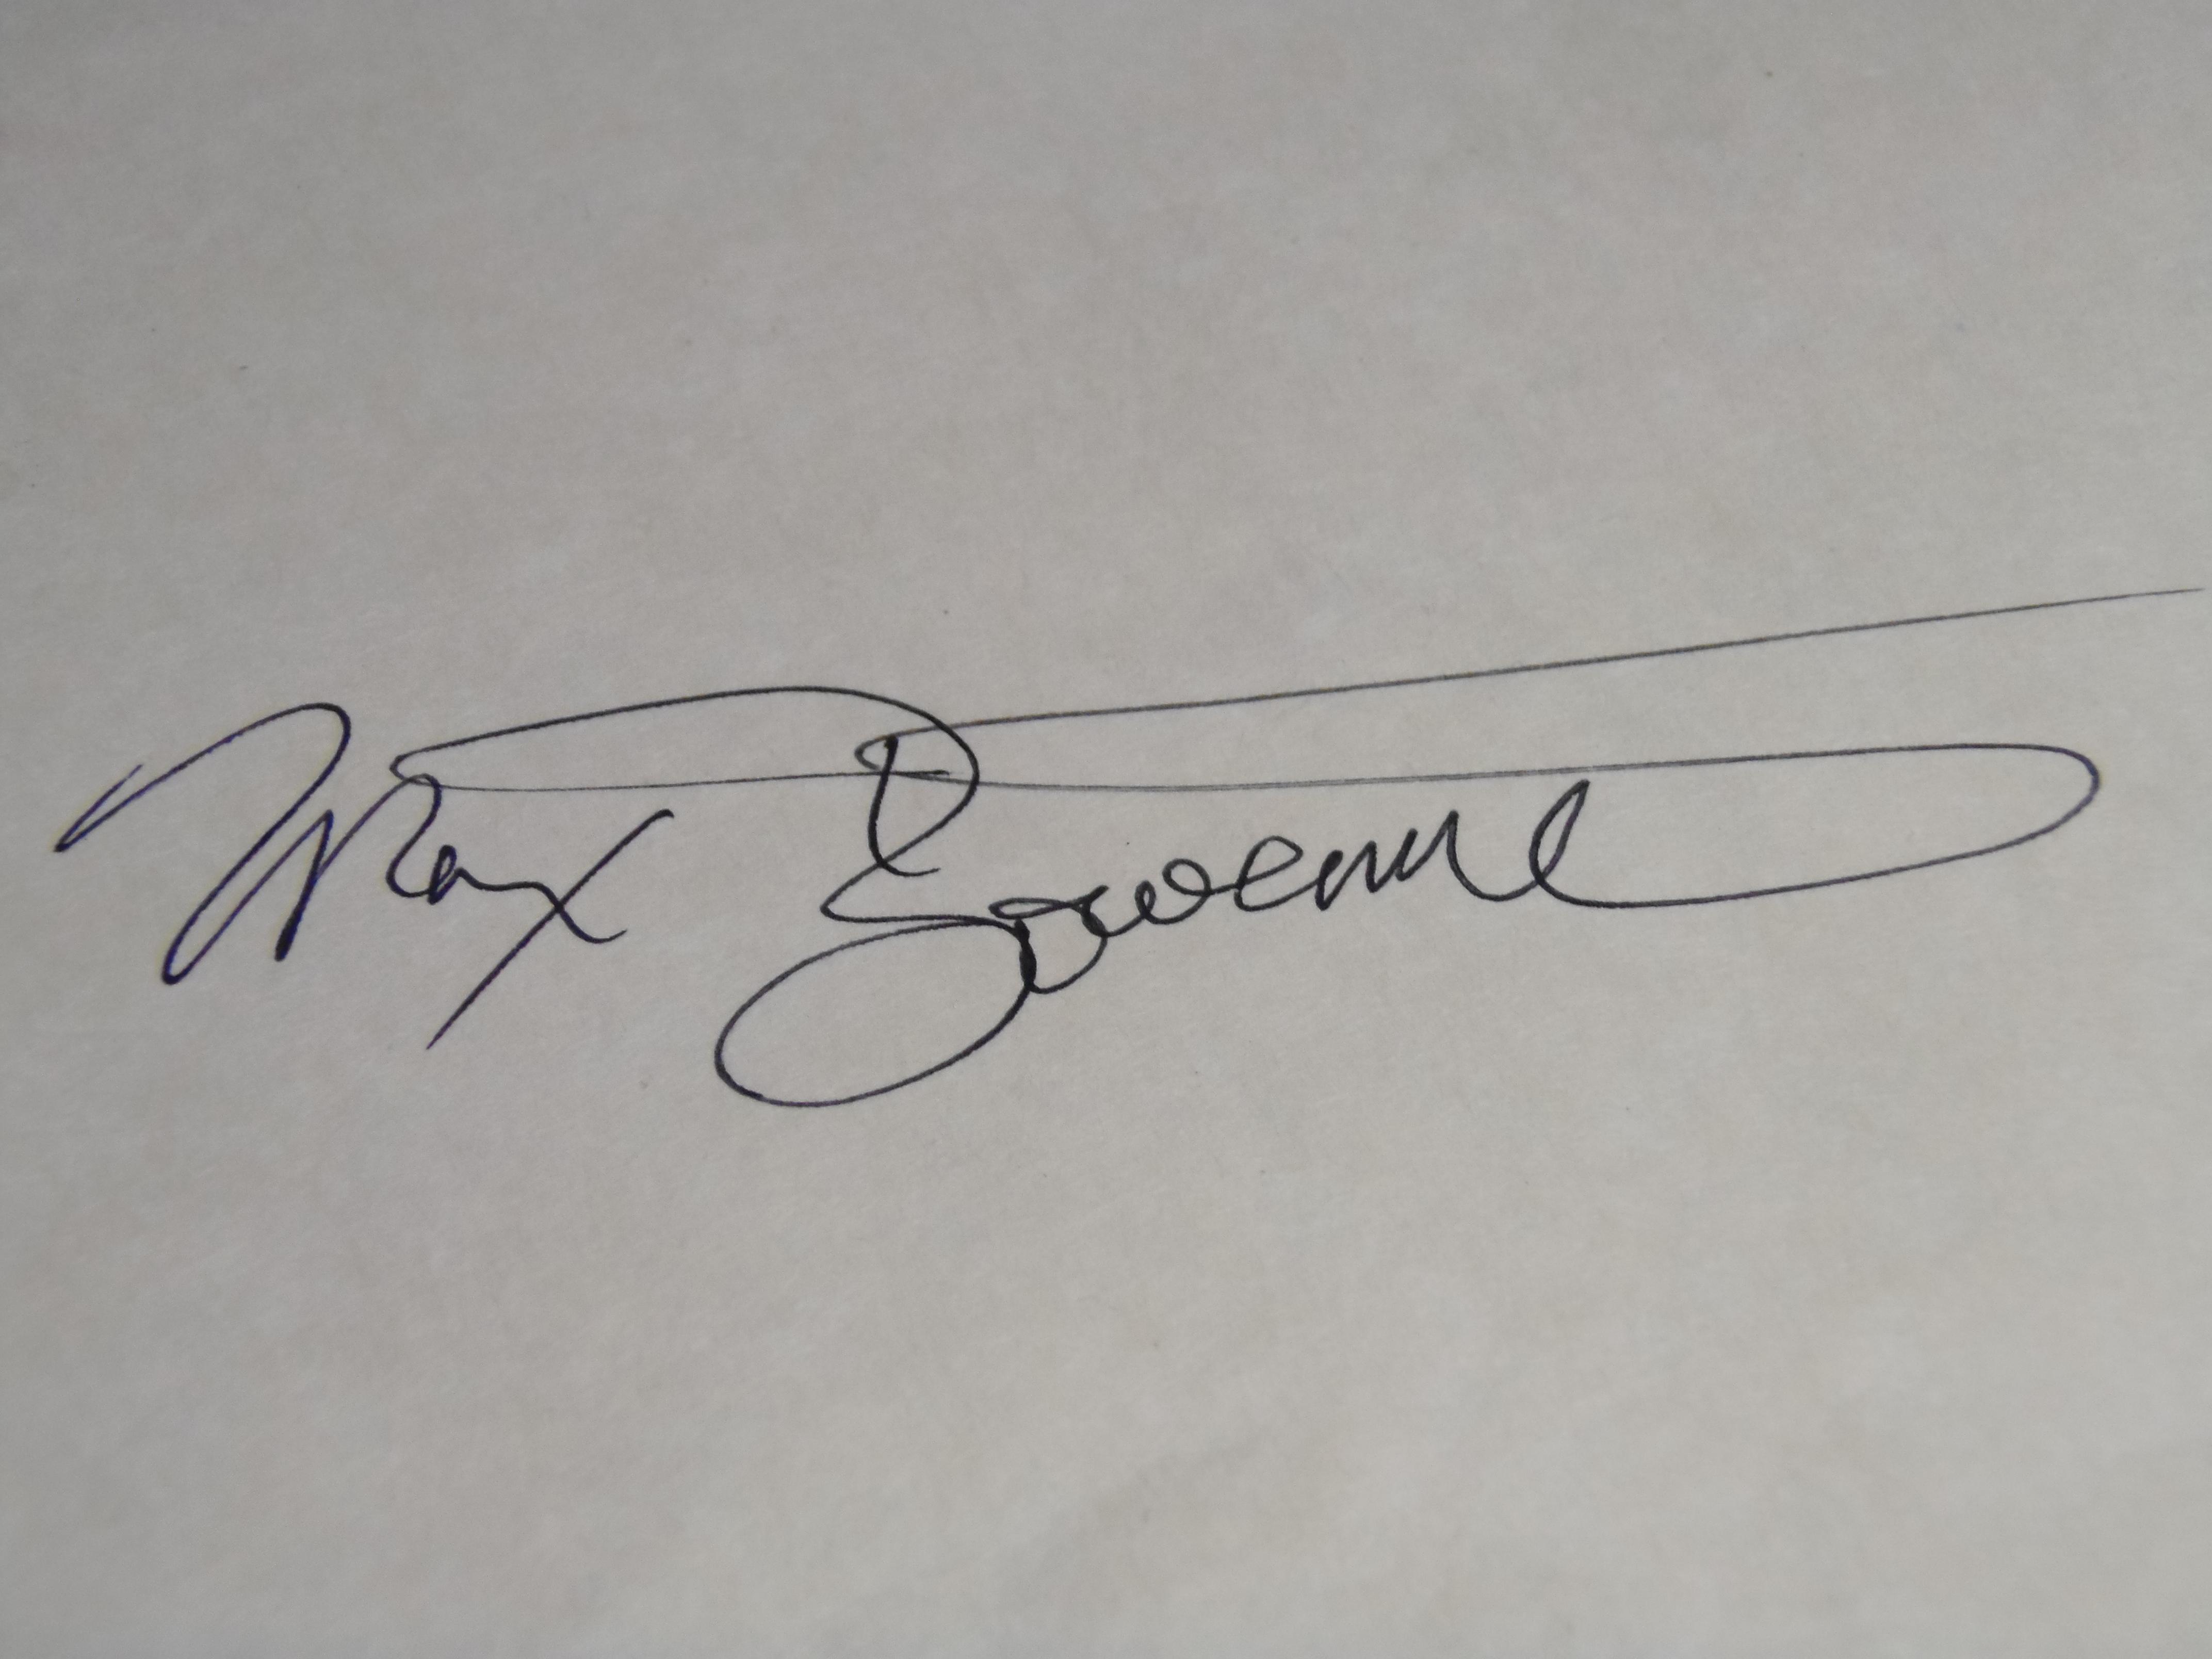 max bowermeister's Signature